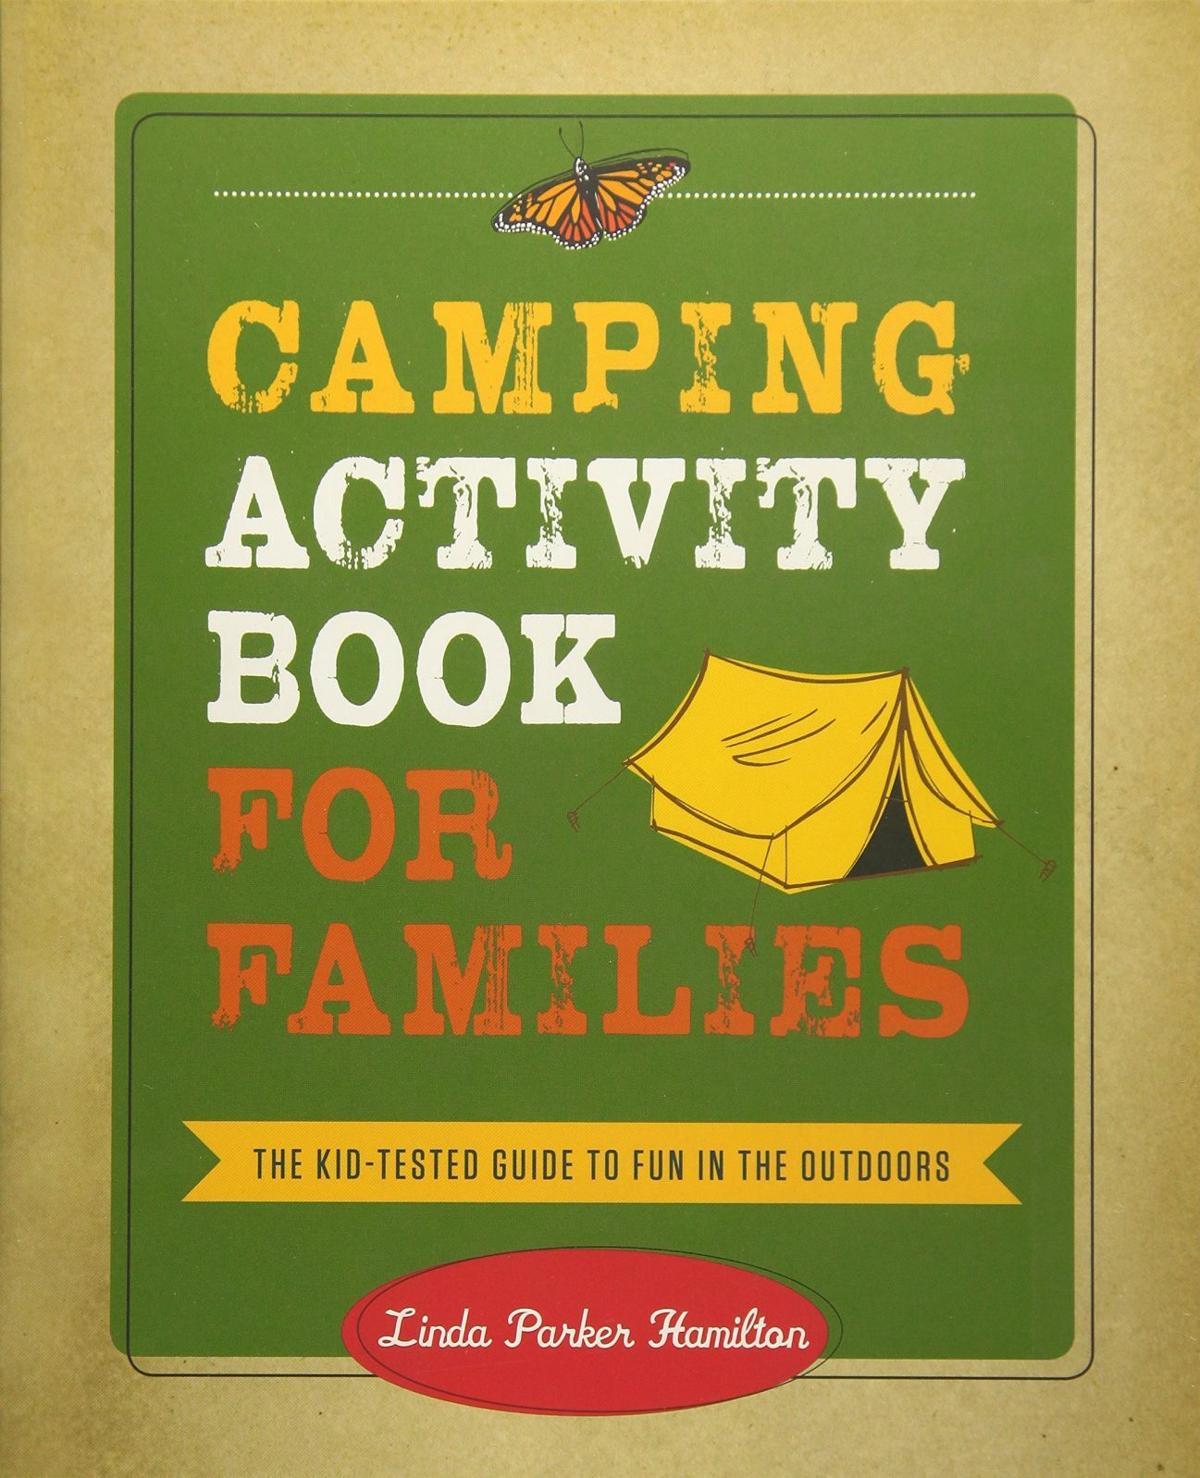 Camping Activity Book